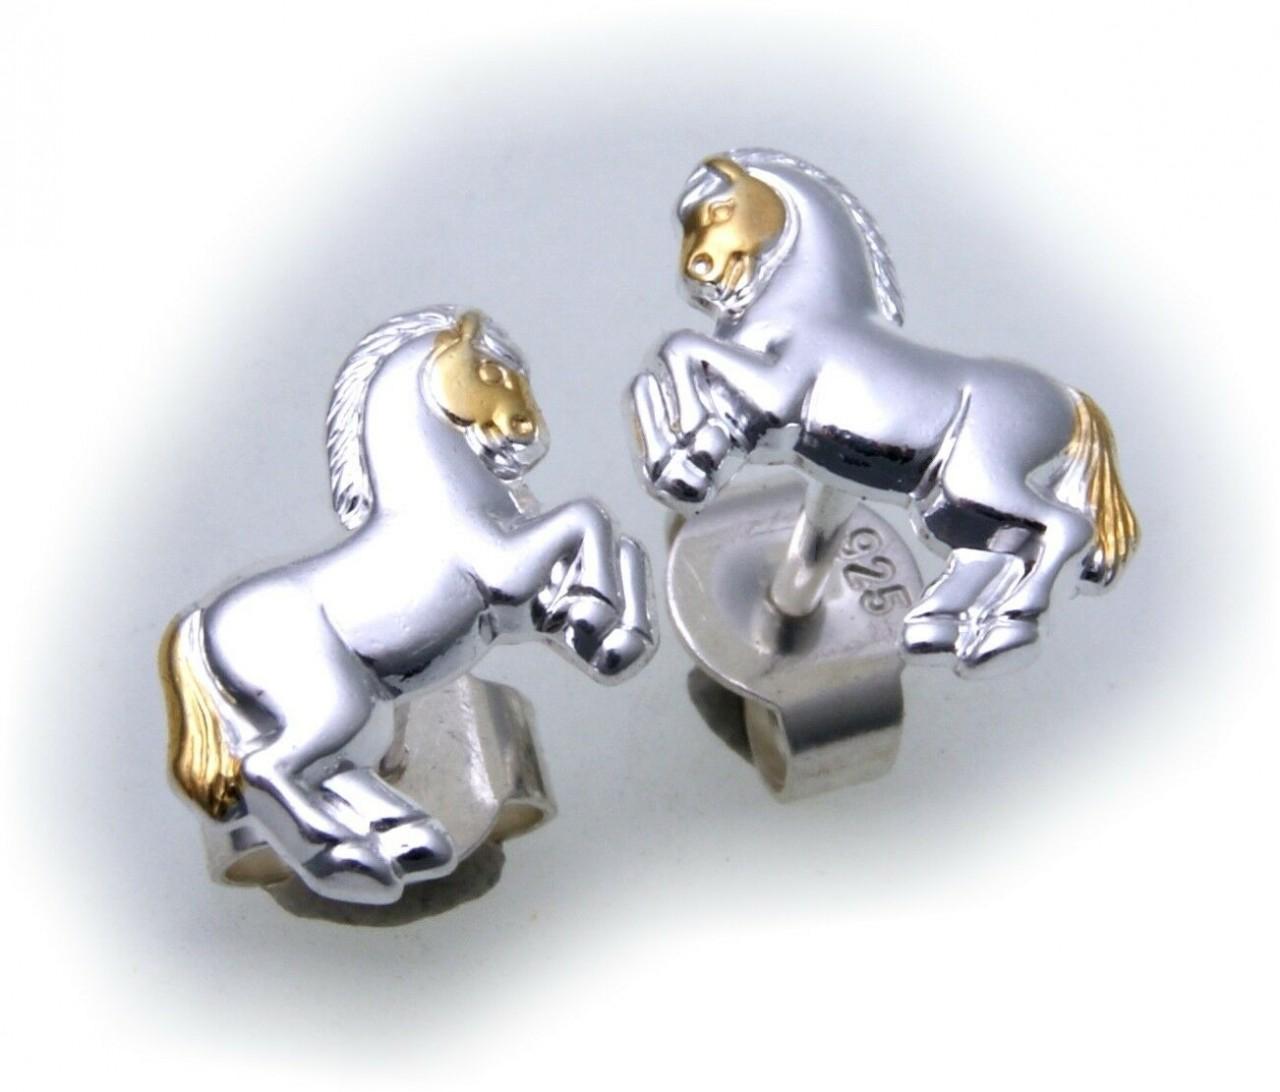 Ohrringe Stecker Pferd groß echt Silber 925 Bicolor massiv Kinderohrringe verg.